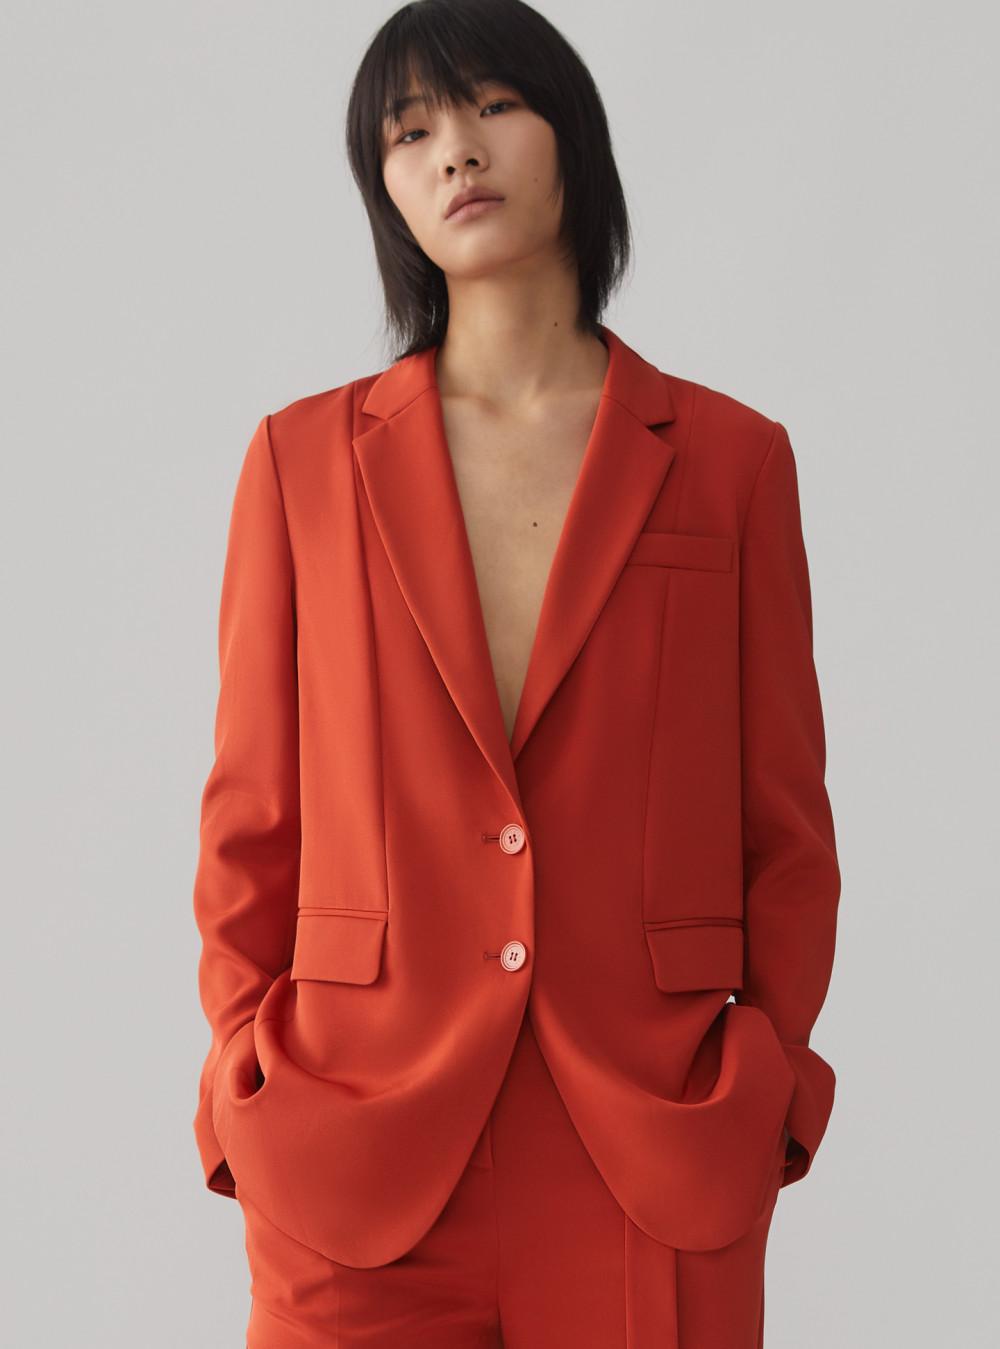 Icicle Women Styles Push Soft Suit